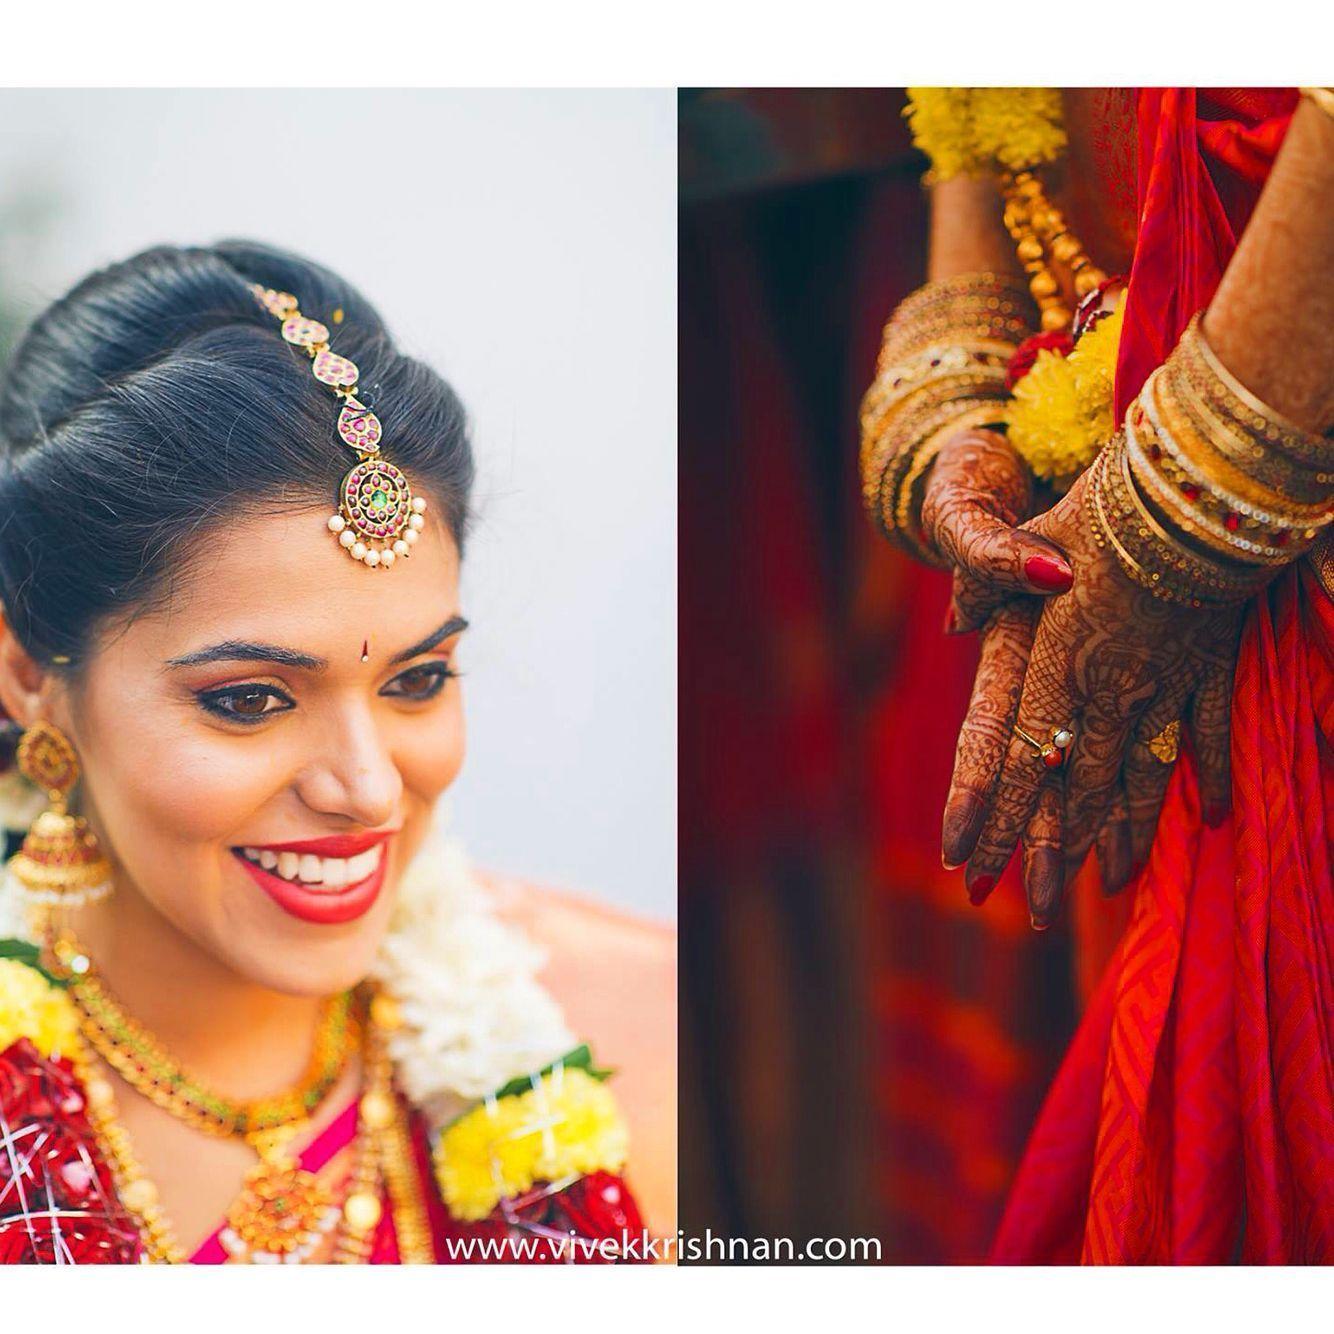 wedding hairstyles in tamil - fine #weddinghairstyles at